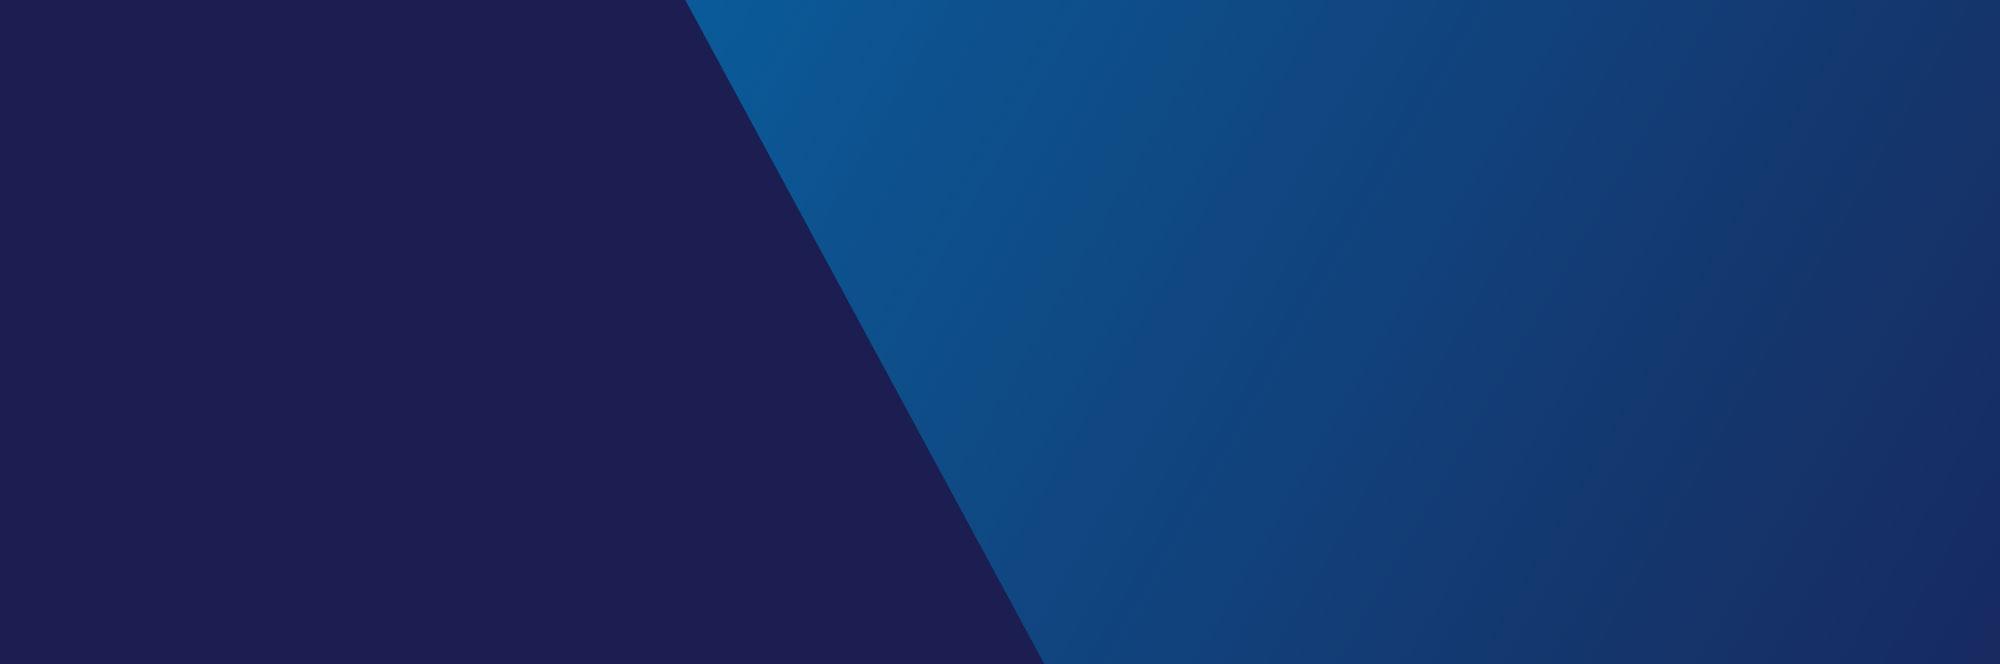 FUD_2020_WEB-1